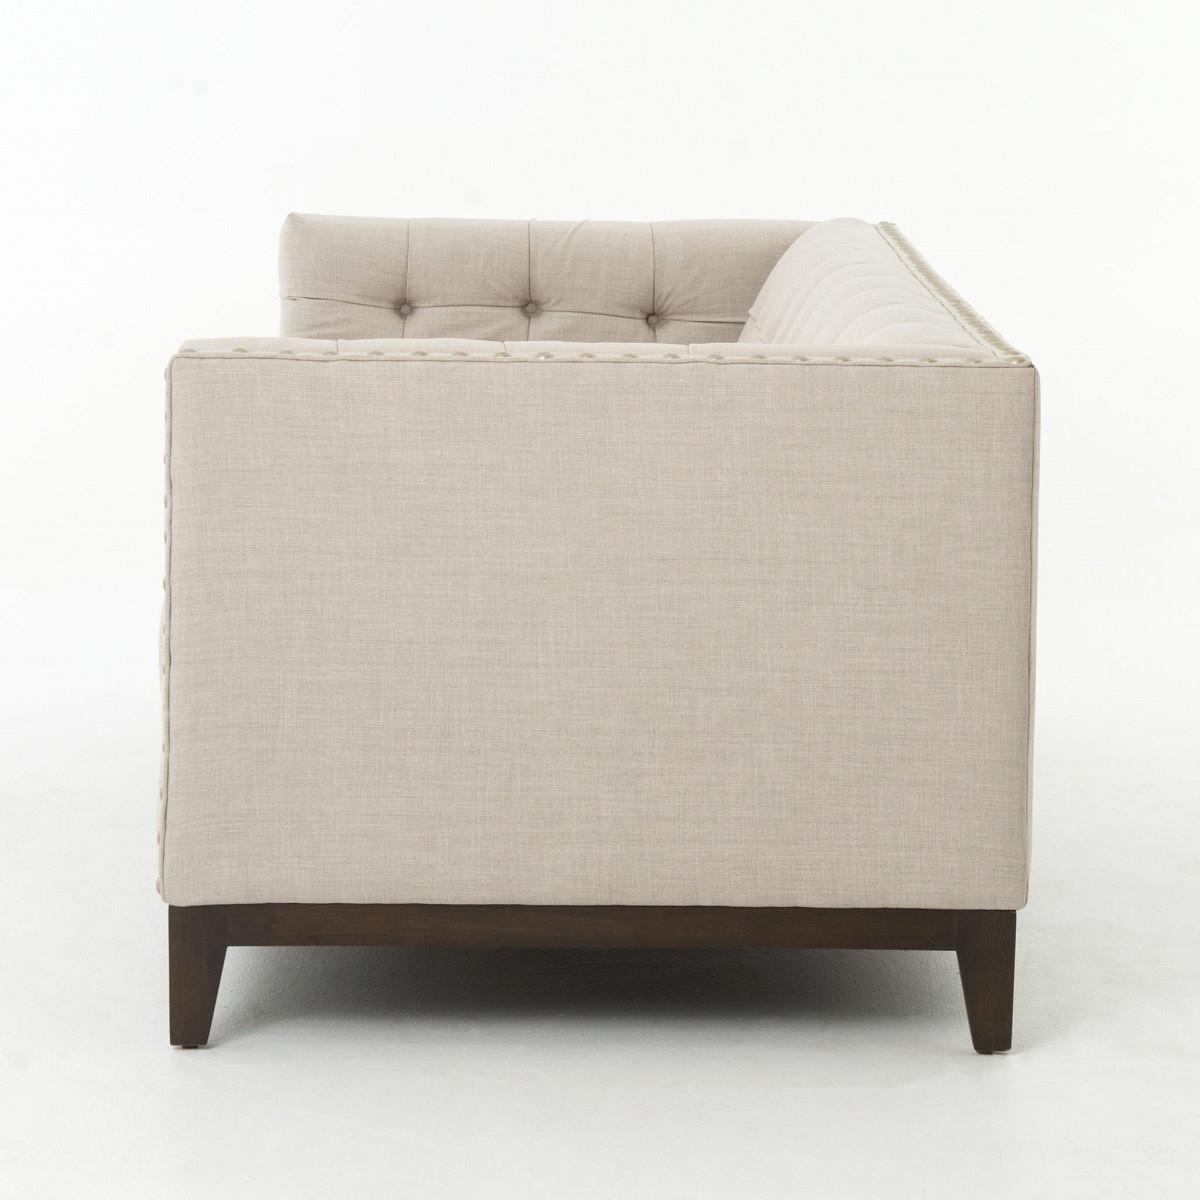 greenwich modern tufted linen nailhead sofa  zin home -  atelier greenwich linen sofa